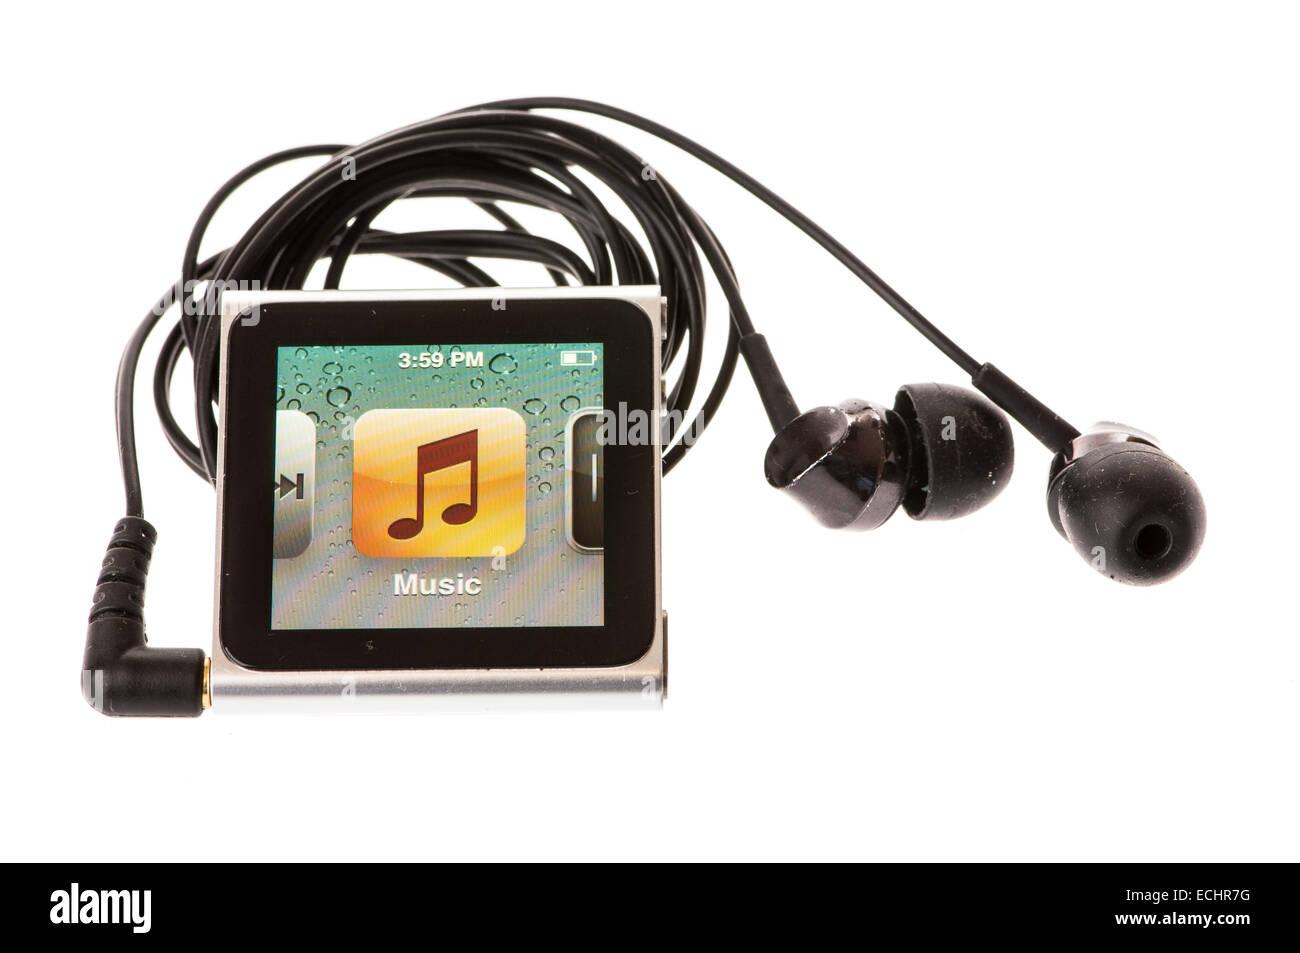 Apple iPod Nano (7th Generation) showing the music menu option - Stock Image